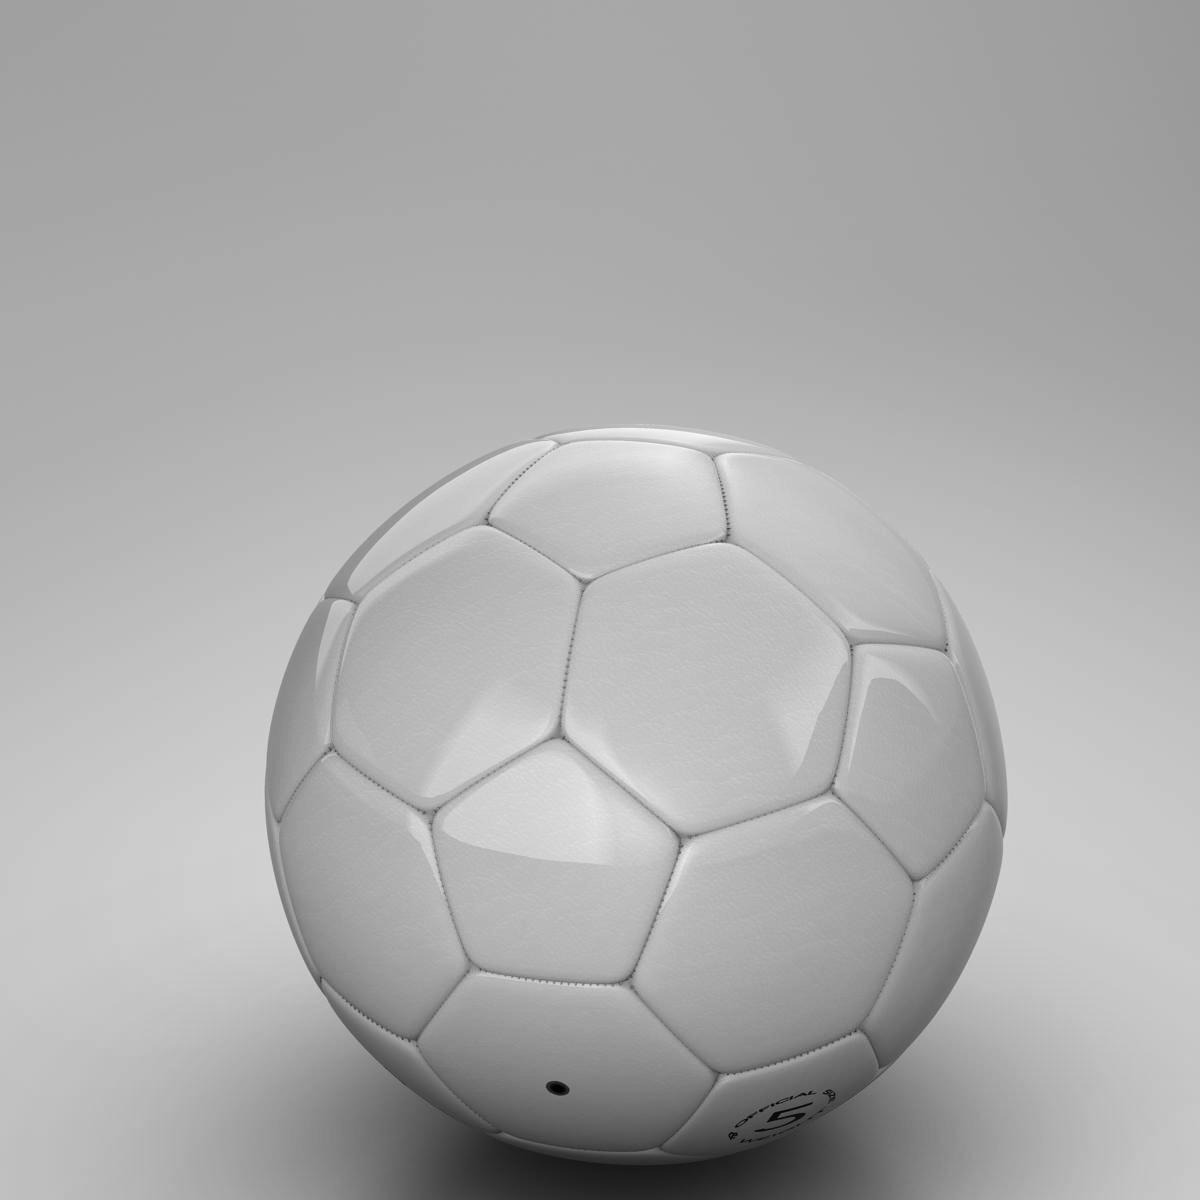 soccerball цагаан 3d загвар 3ds max fbx c4d ma mb obj 205184